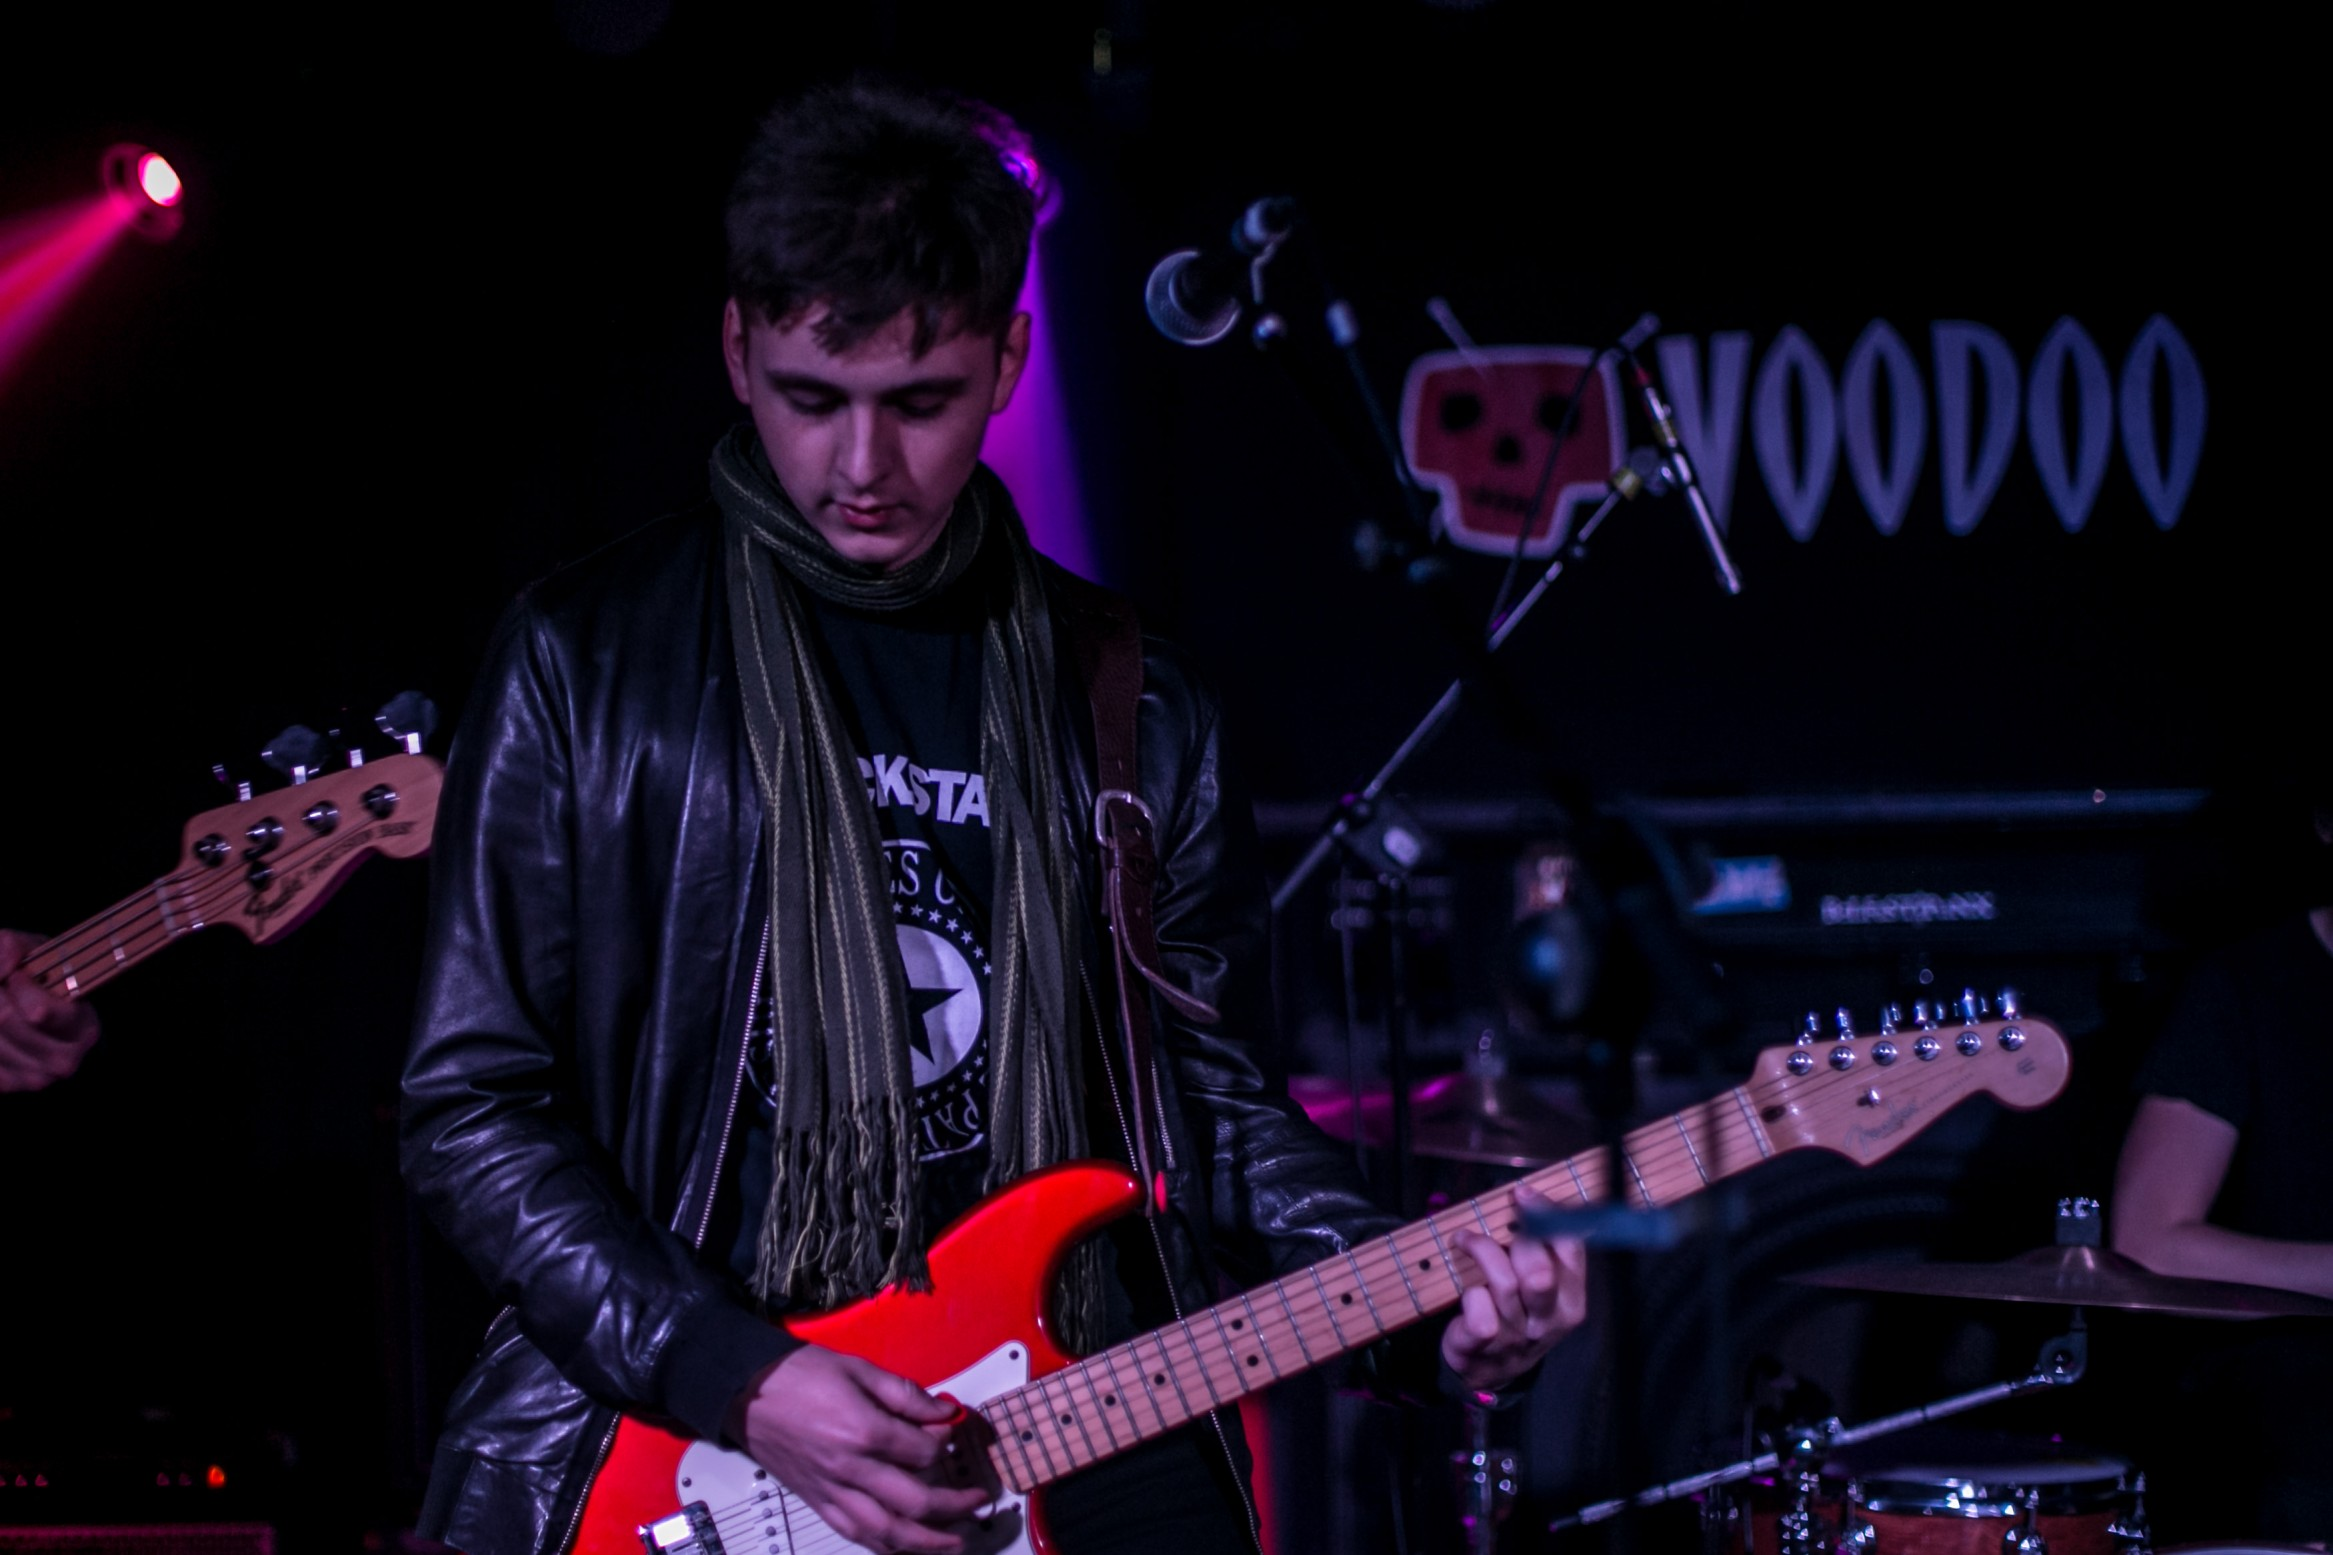 The Sherlocks @ Voodoo Belfast 11